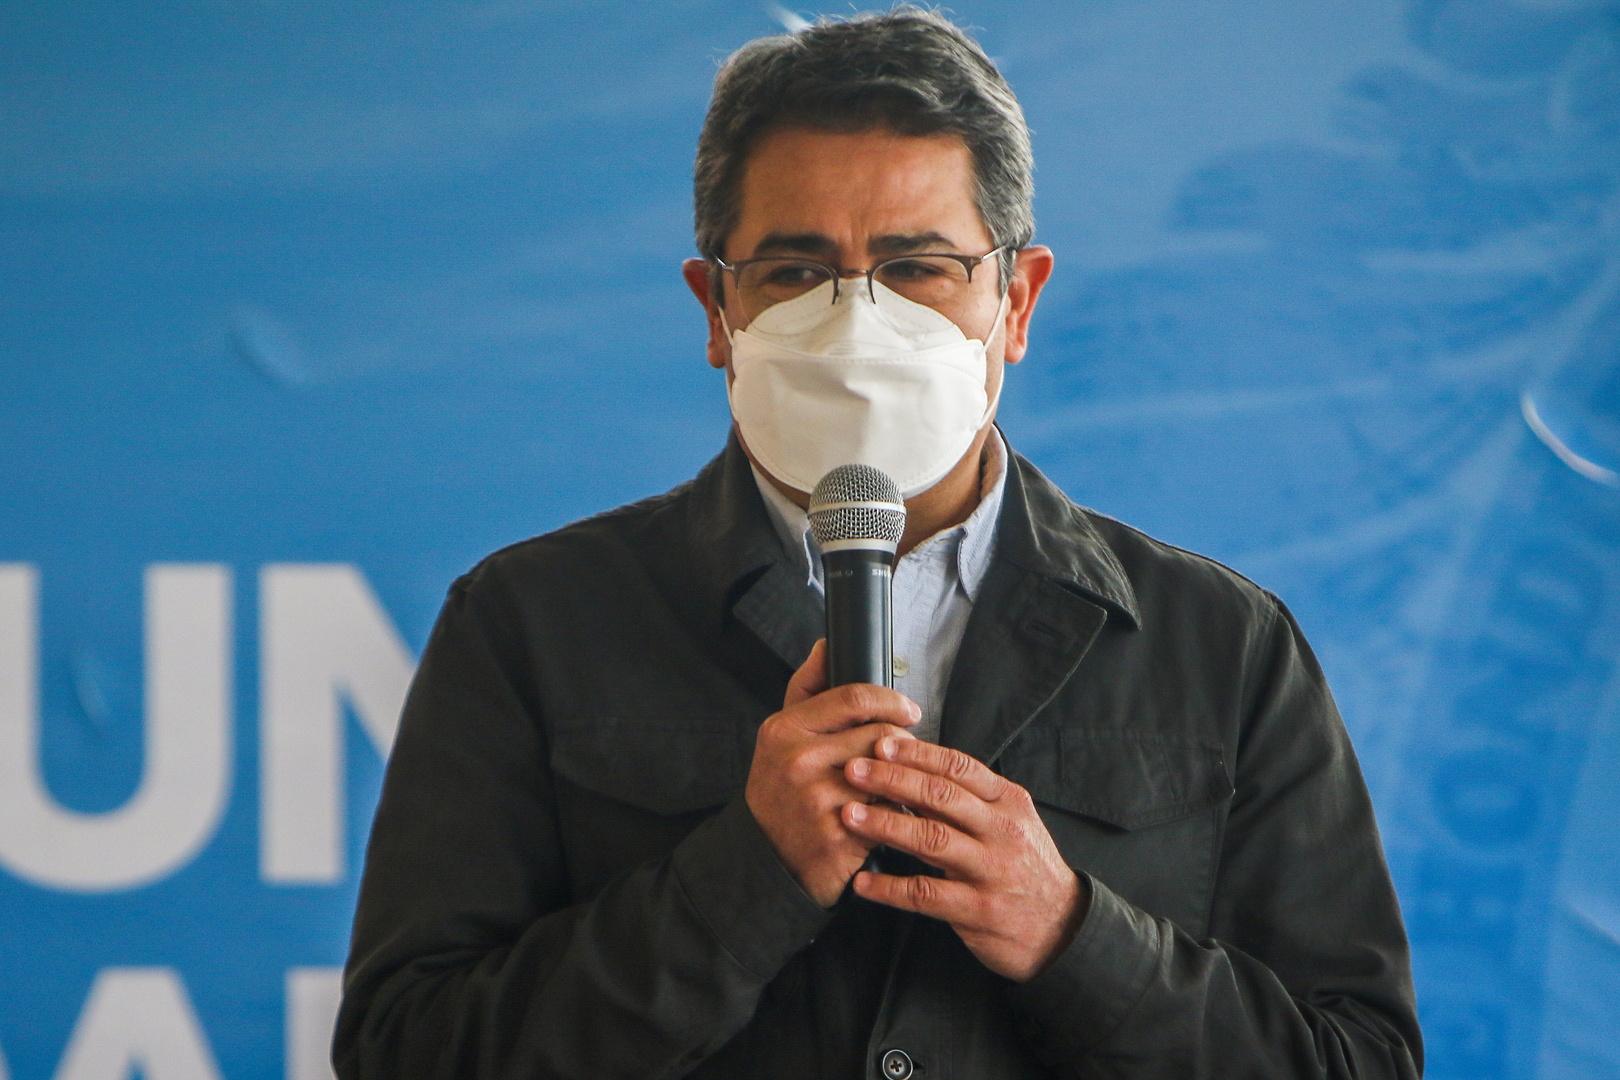 رئيس هندوراس يعلن توقيع عقد لشراء لقاح